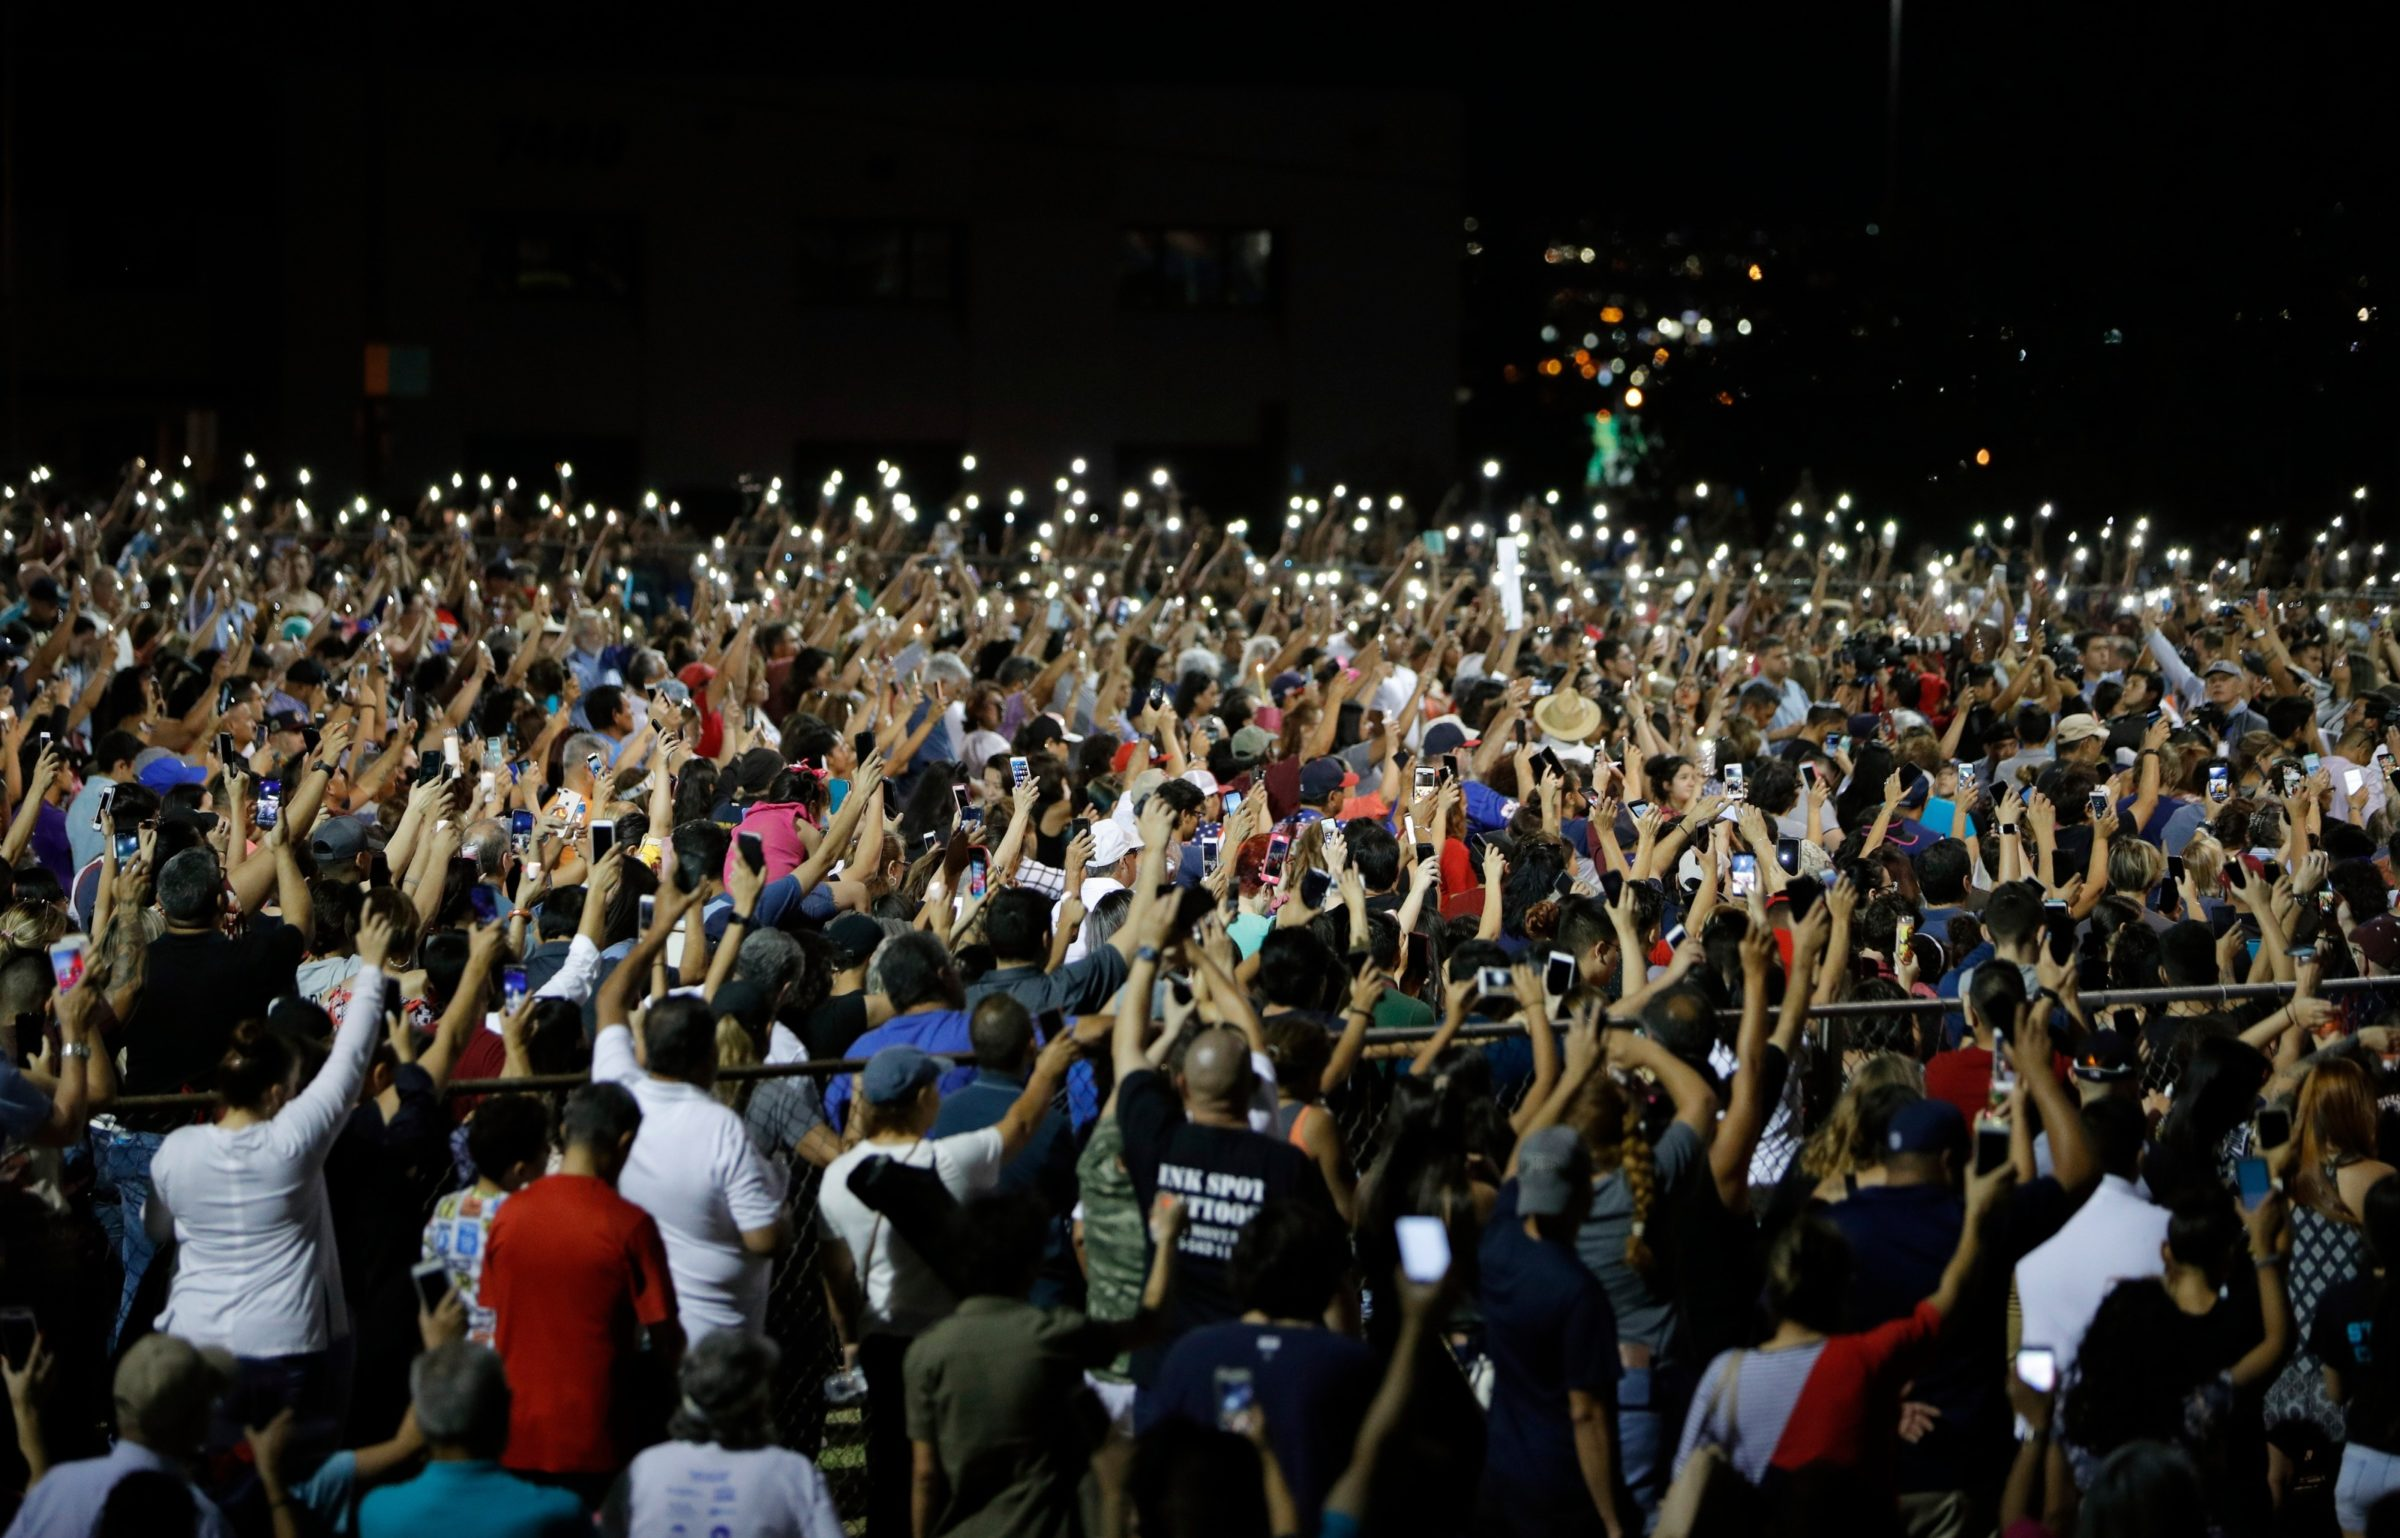 AP_19217133516967_resized El Paso Vigil